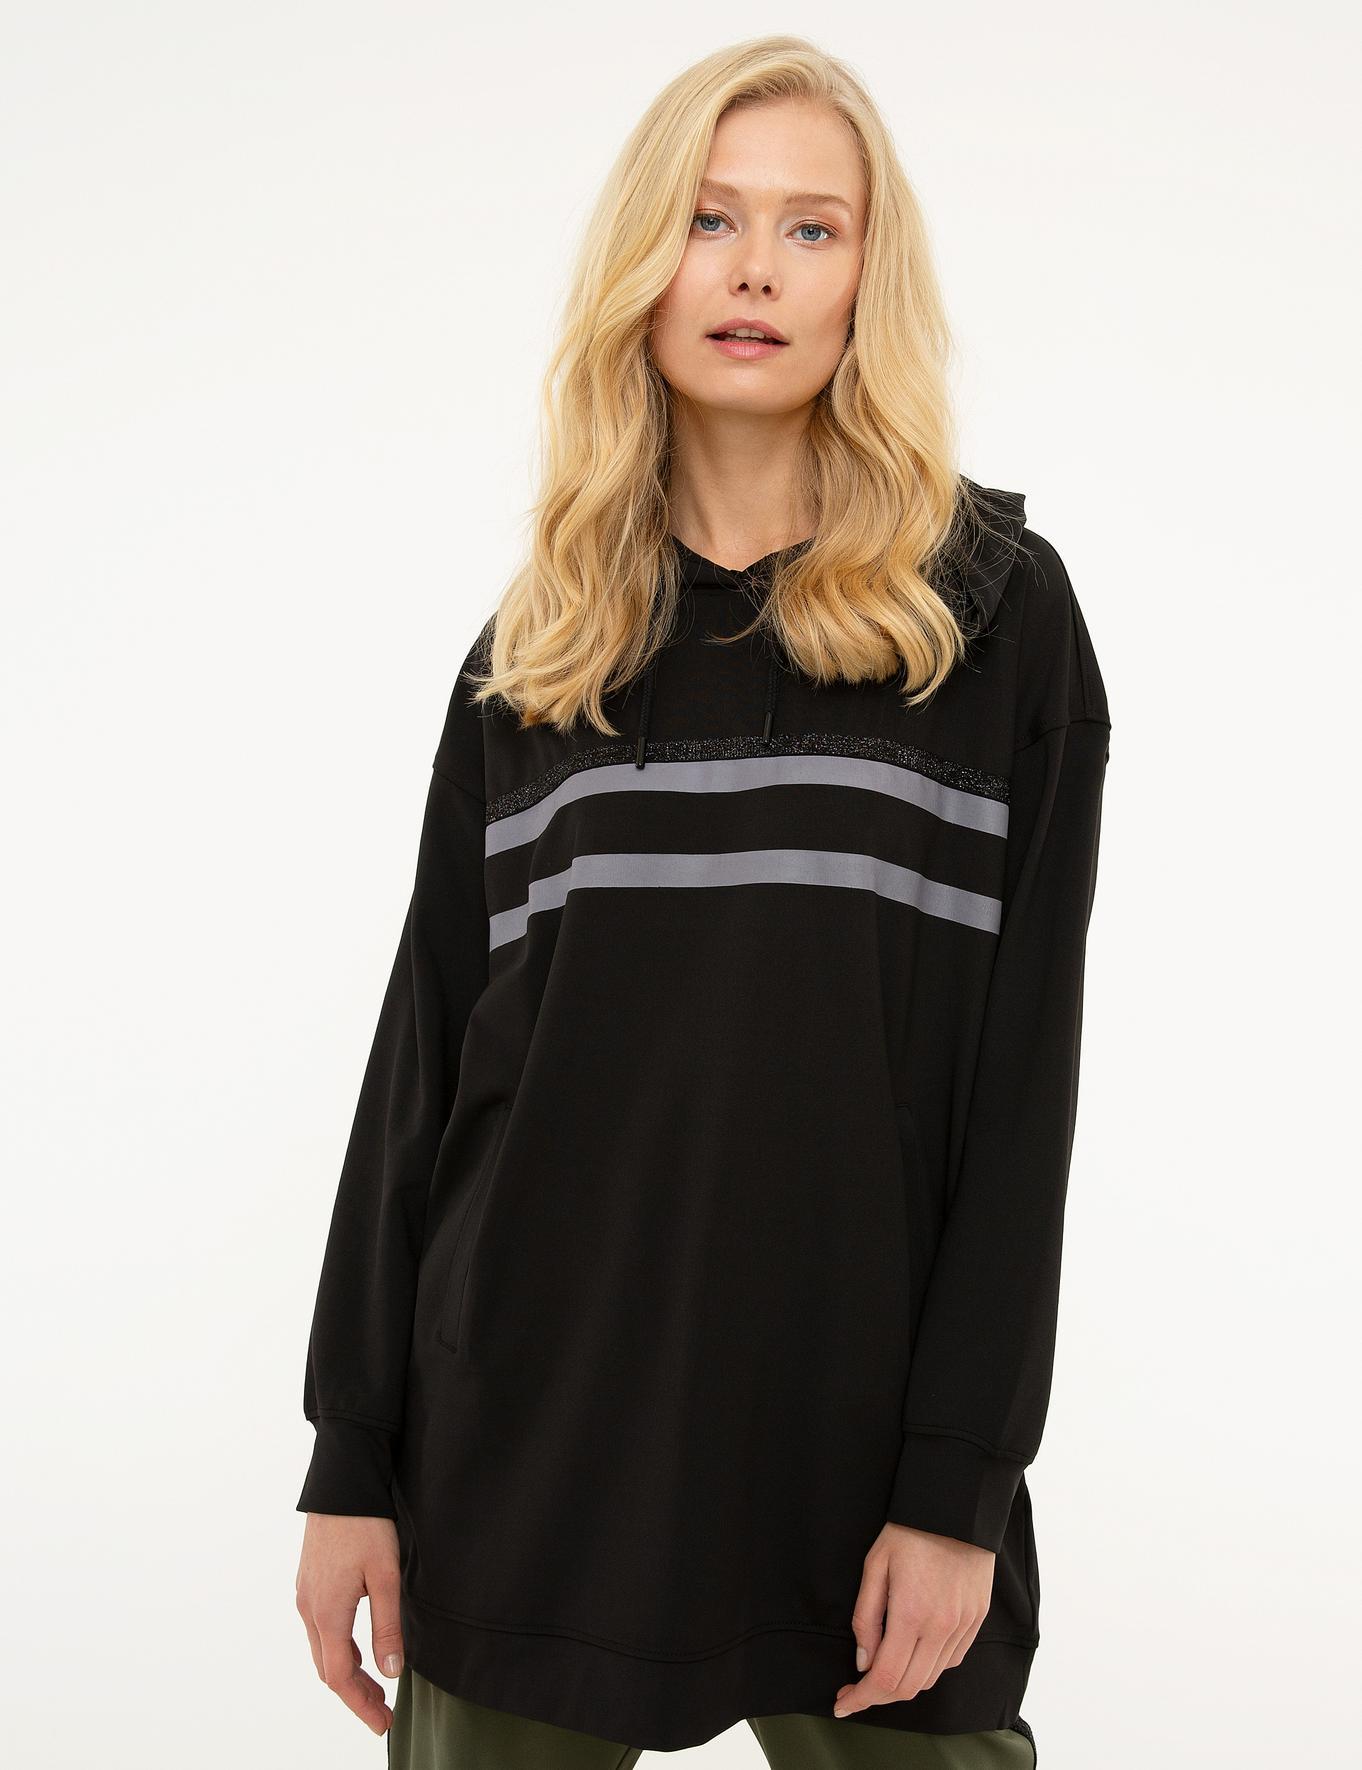 Siyah Sweatshirt